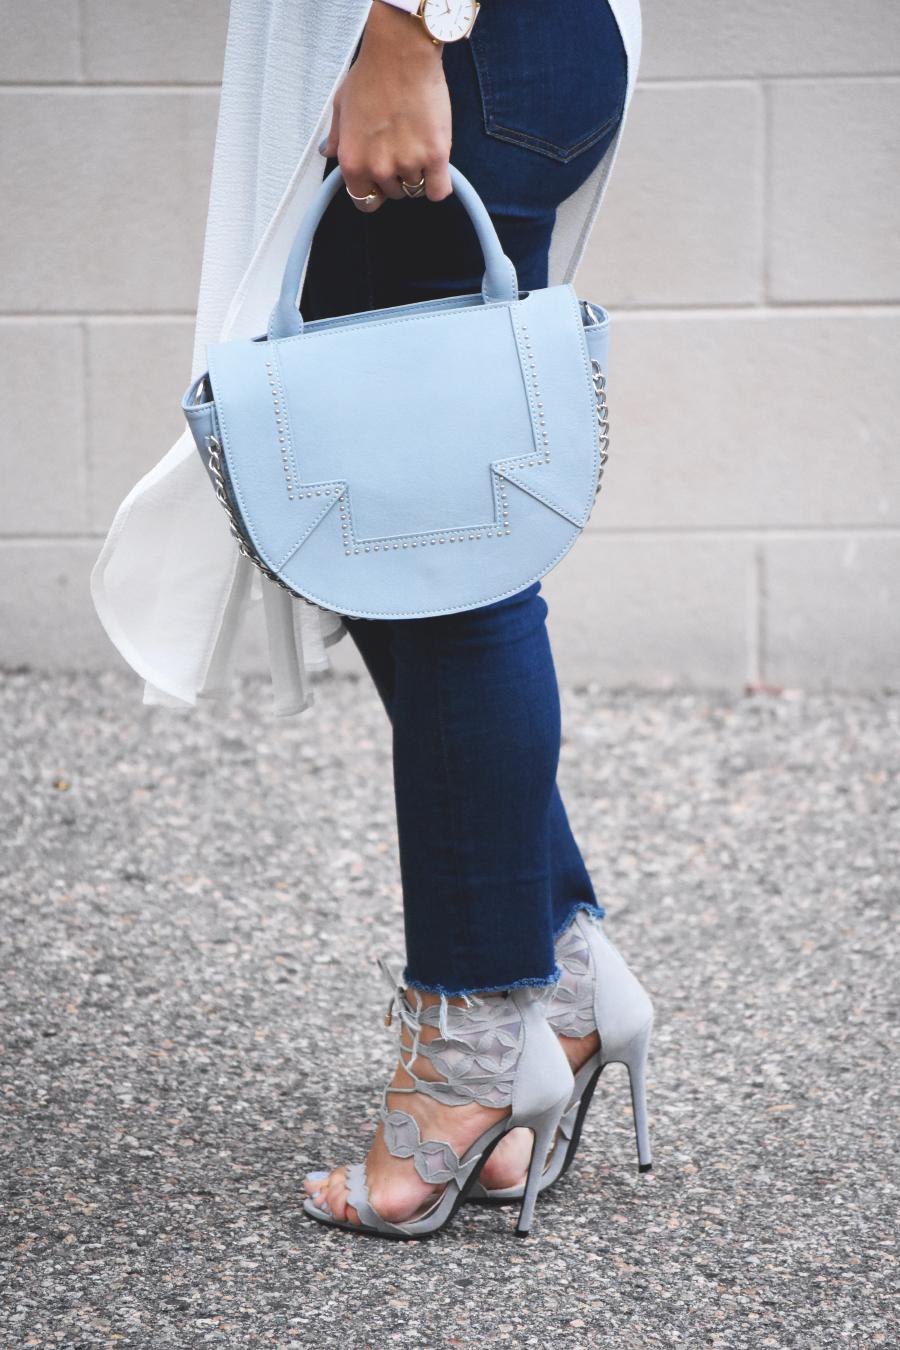 Danielle Nicole blue handbag